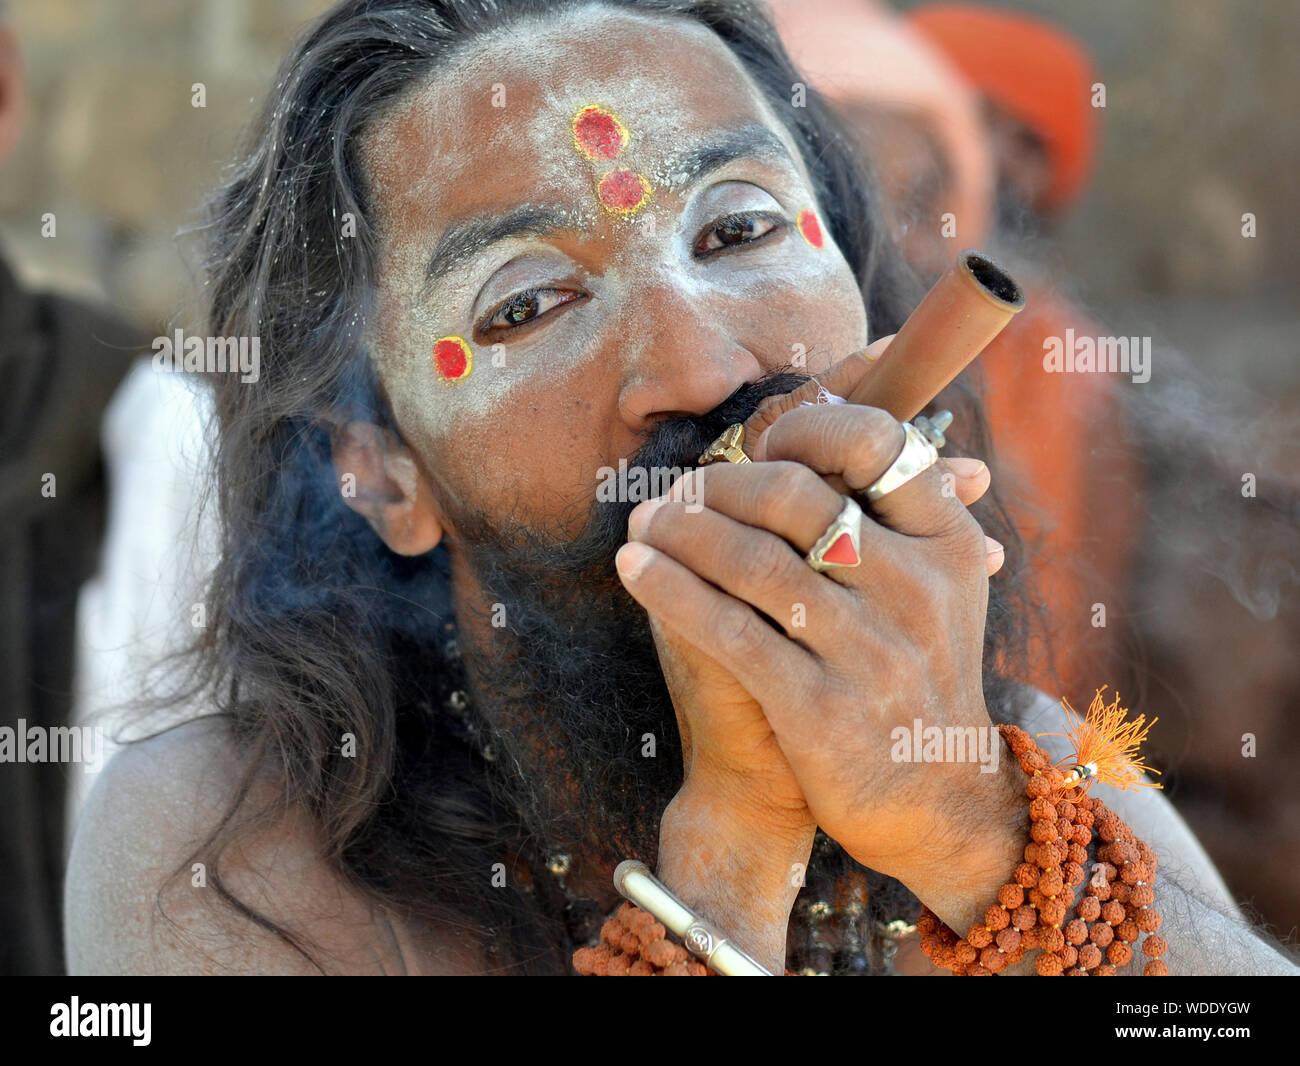 PHOTOS: Makarsankranti Photo Gallery, Picture News Gallery